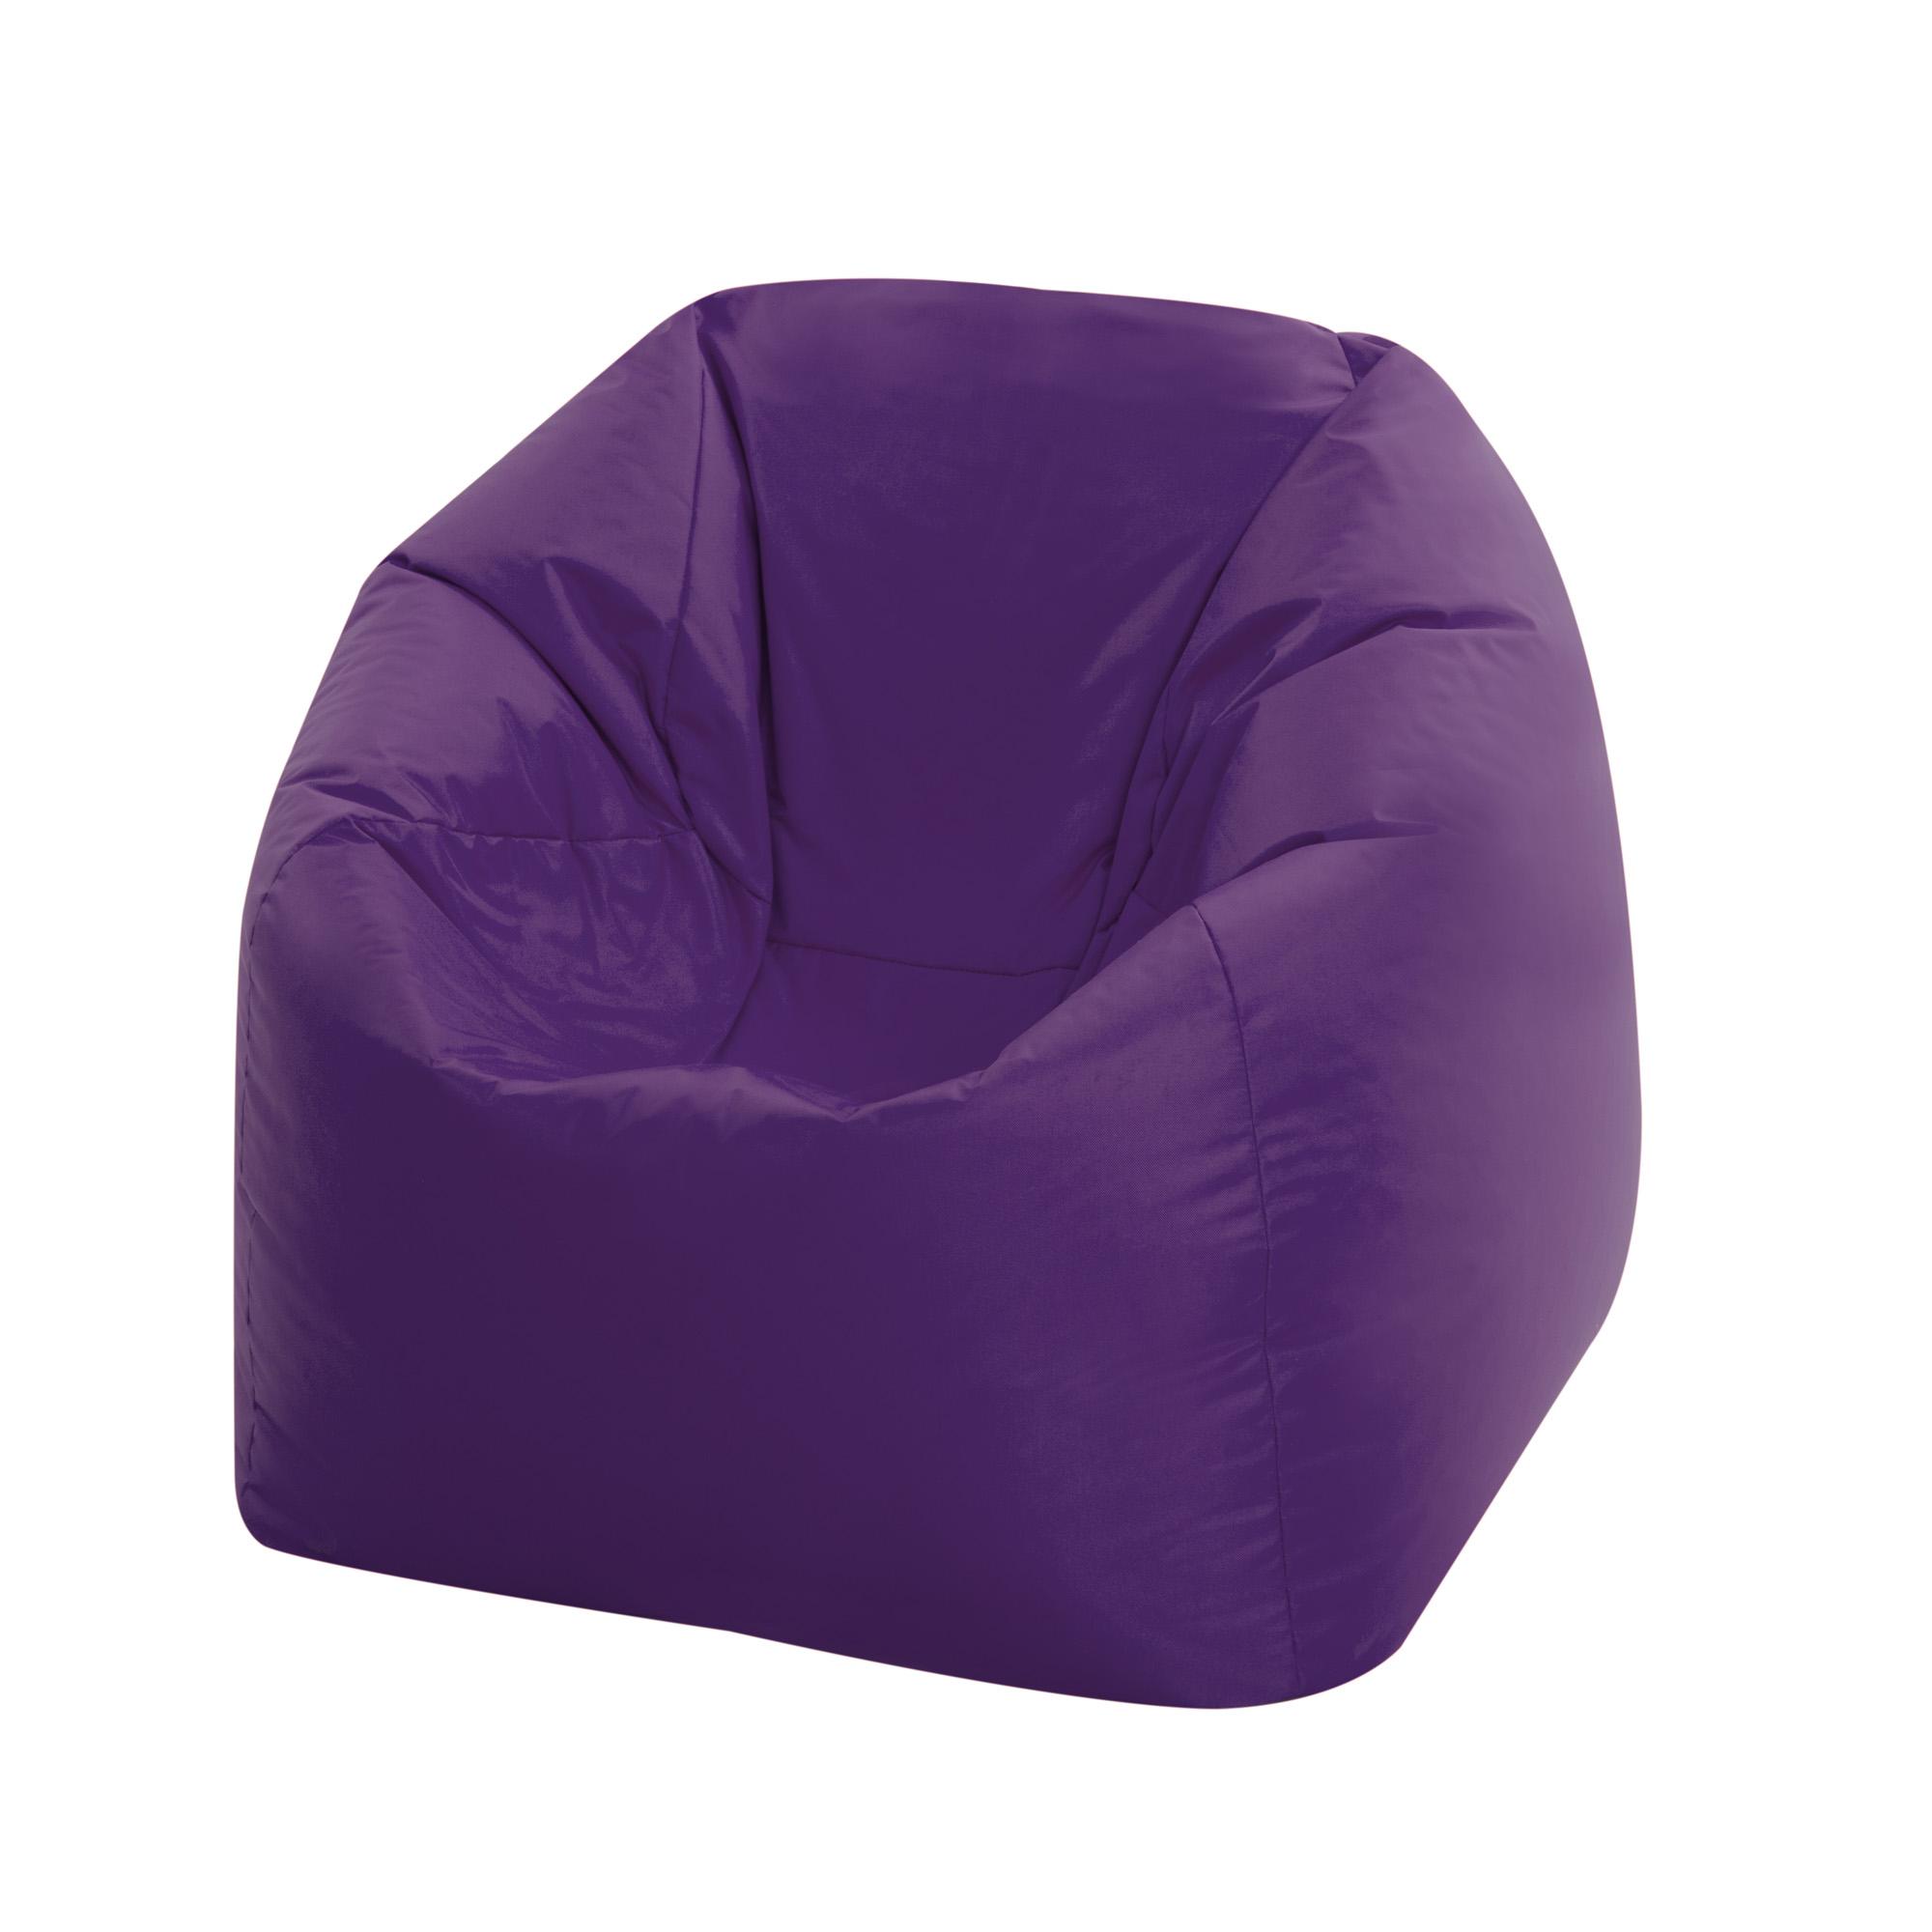 Eden-New-Nursery-Beanbag-purple-300dpi-2